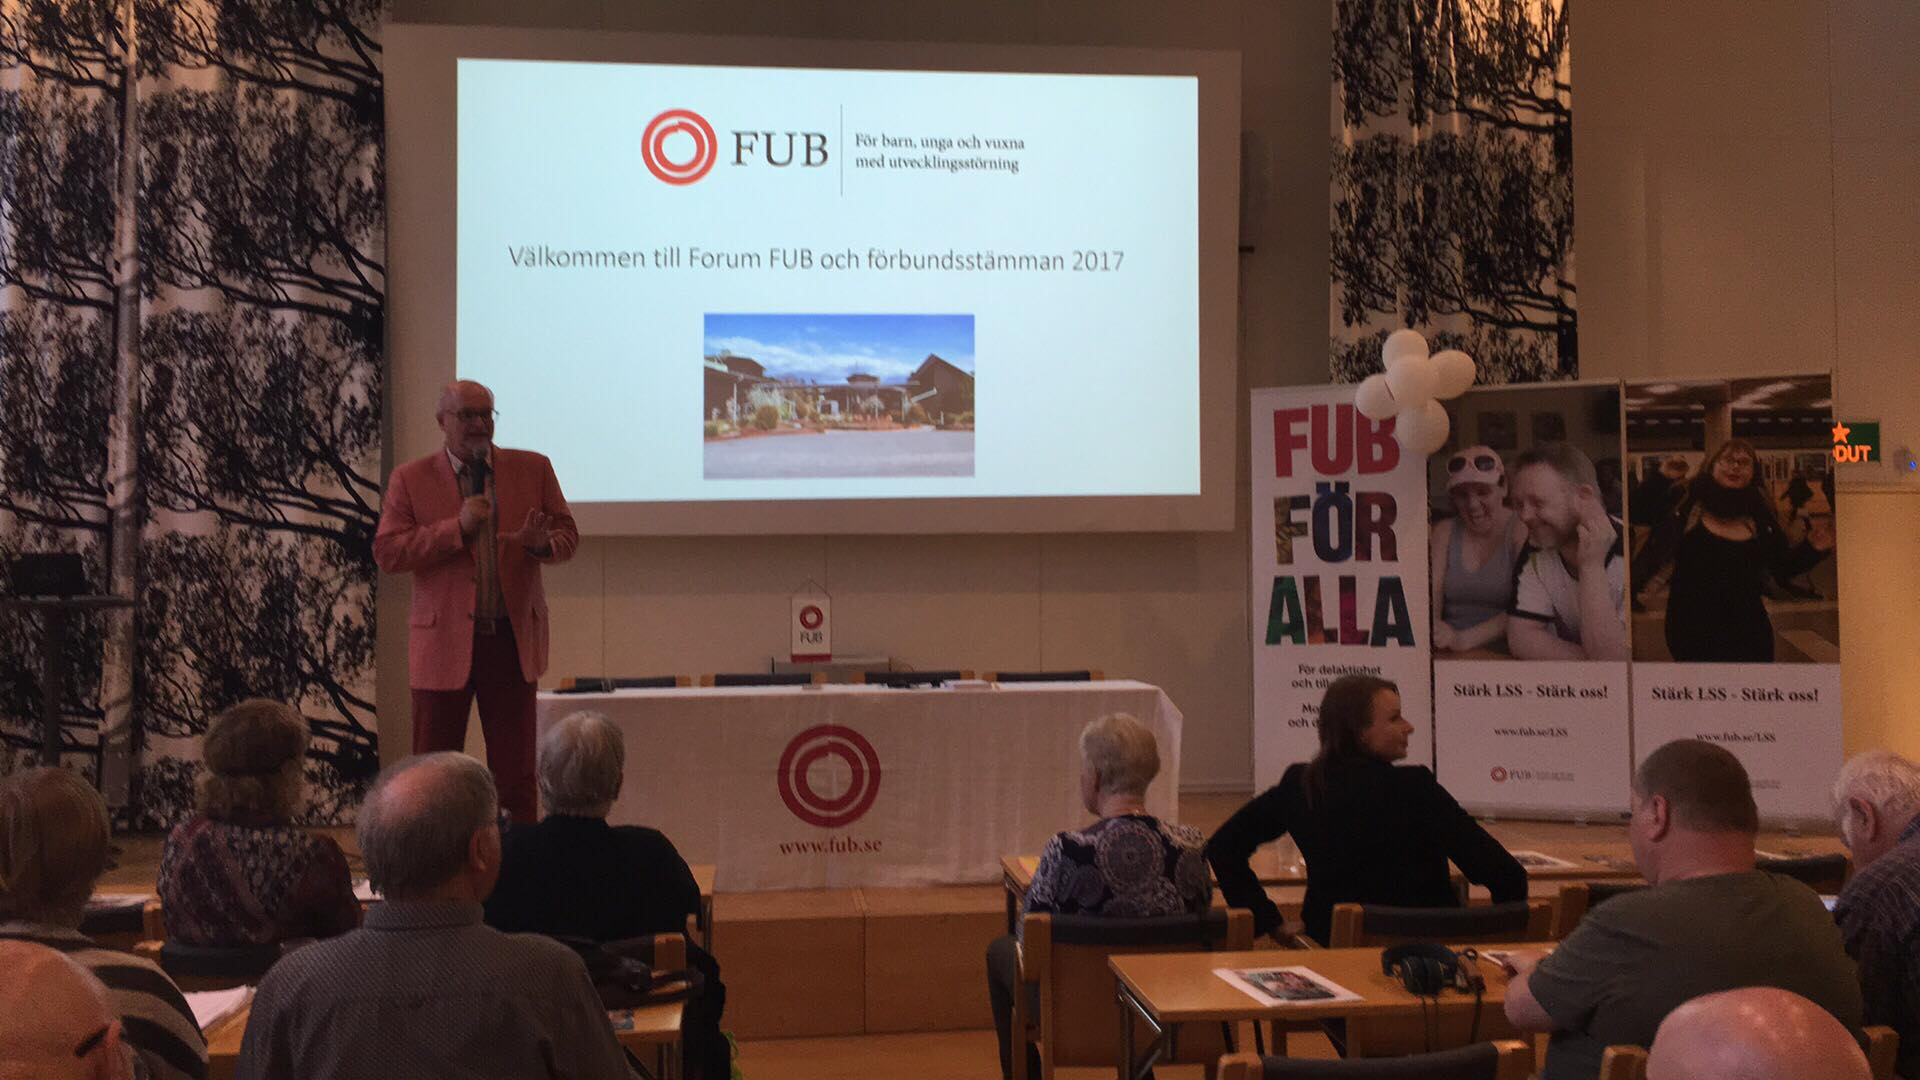 Forum FUB 2017 Riksförbundet FUB:s ordförande Thomas Jansson inleder